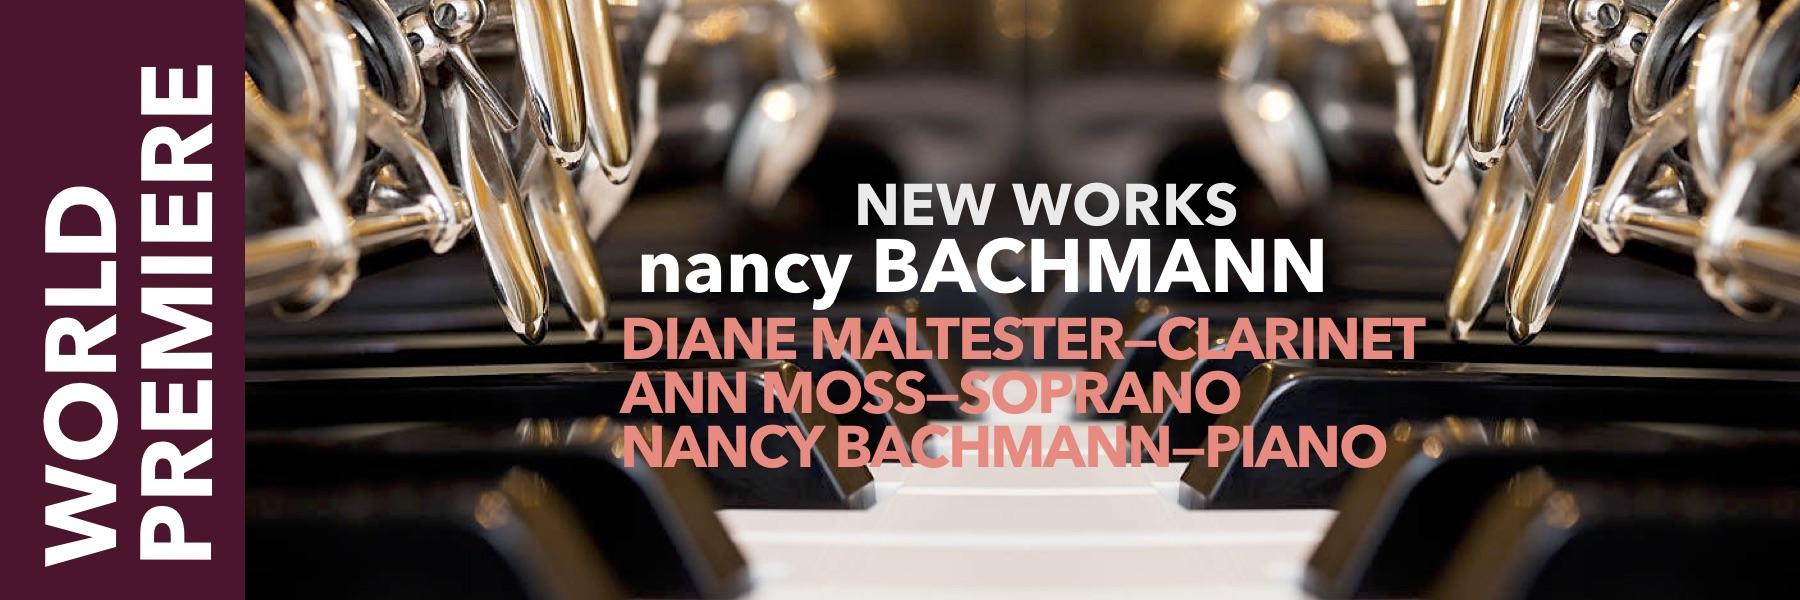 2018 BachmannOct.jpg